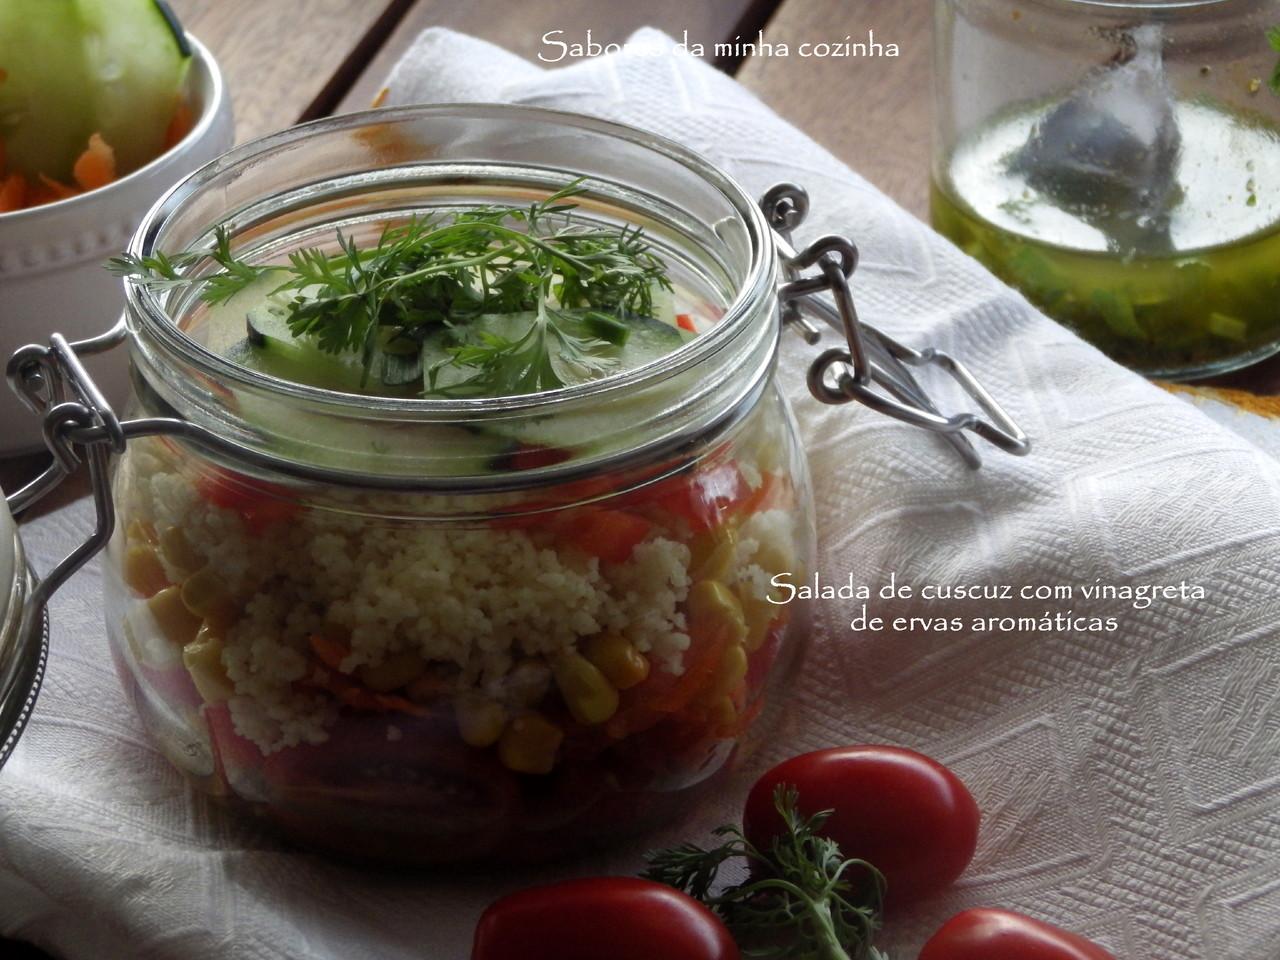 IMGP4893-Saladade cuscuz-Blog.JPG